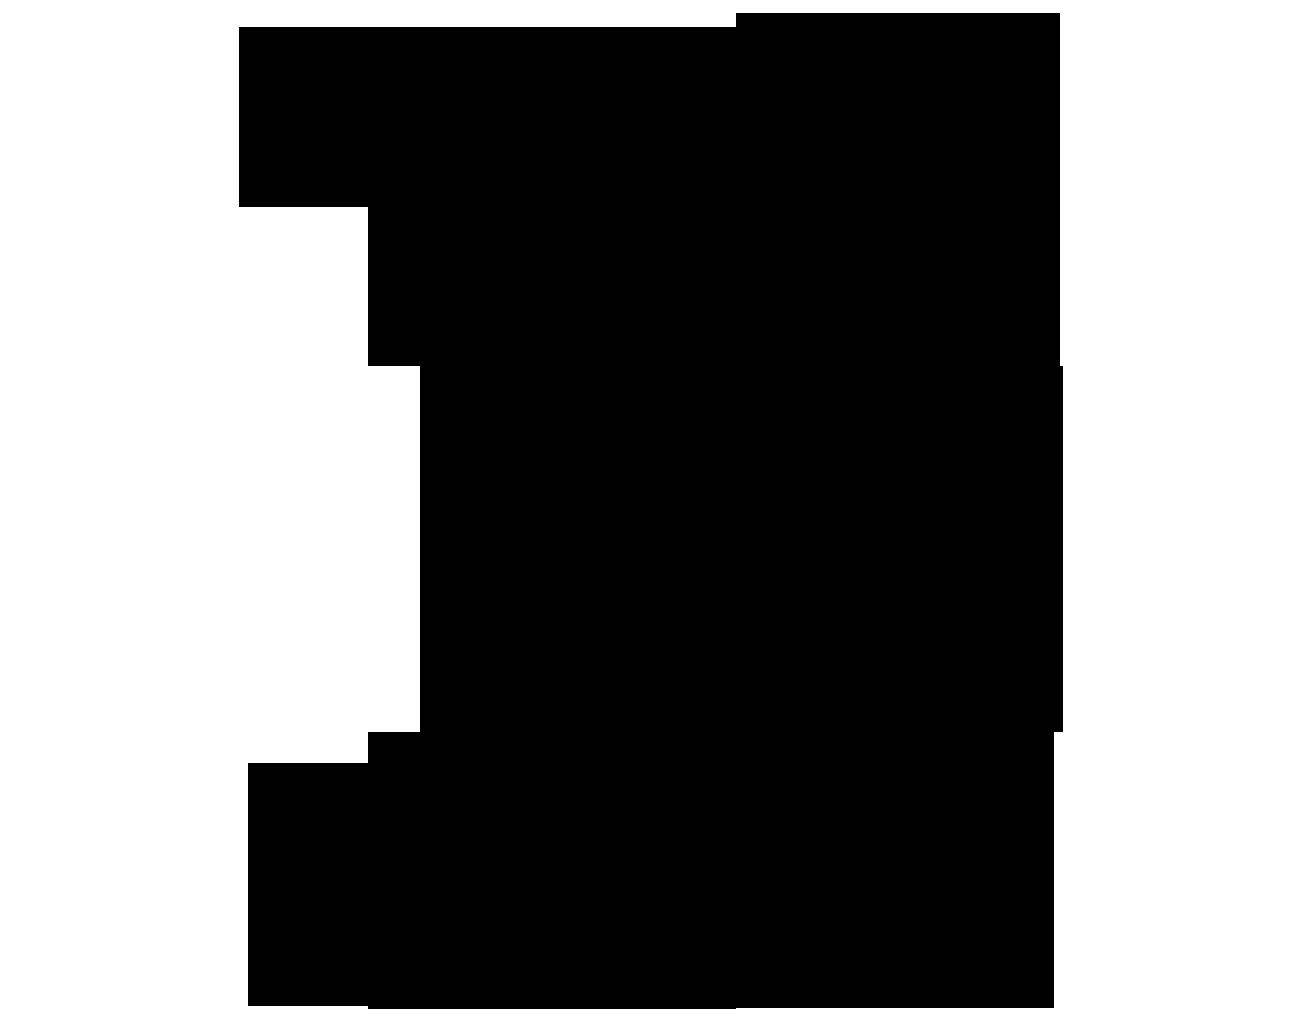 Louis vuitton logo louis vuitton symbol meaning history and evolution louis vuitton logo biocorpaavc Images